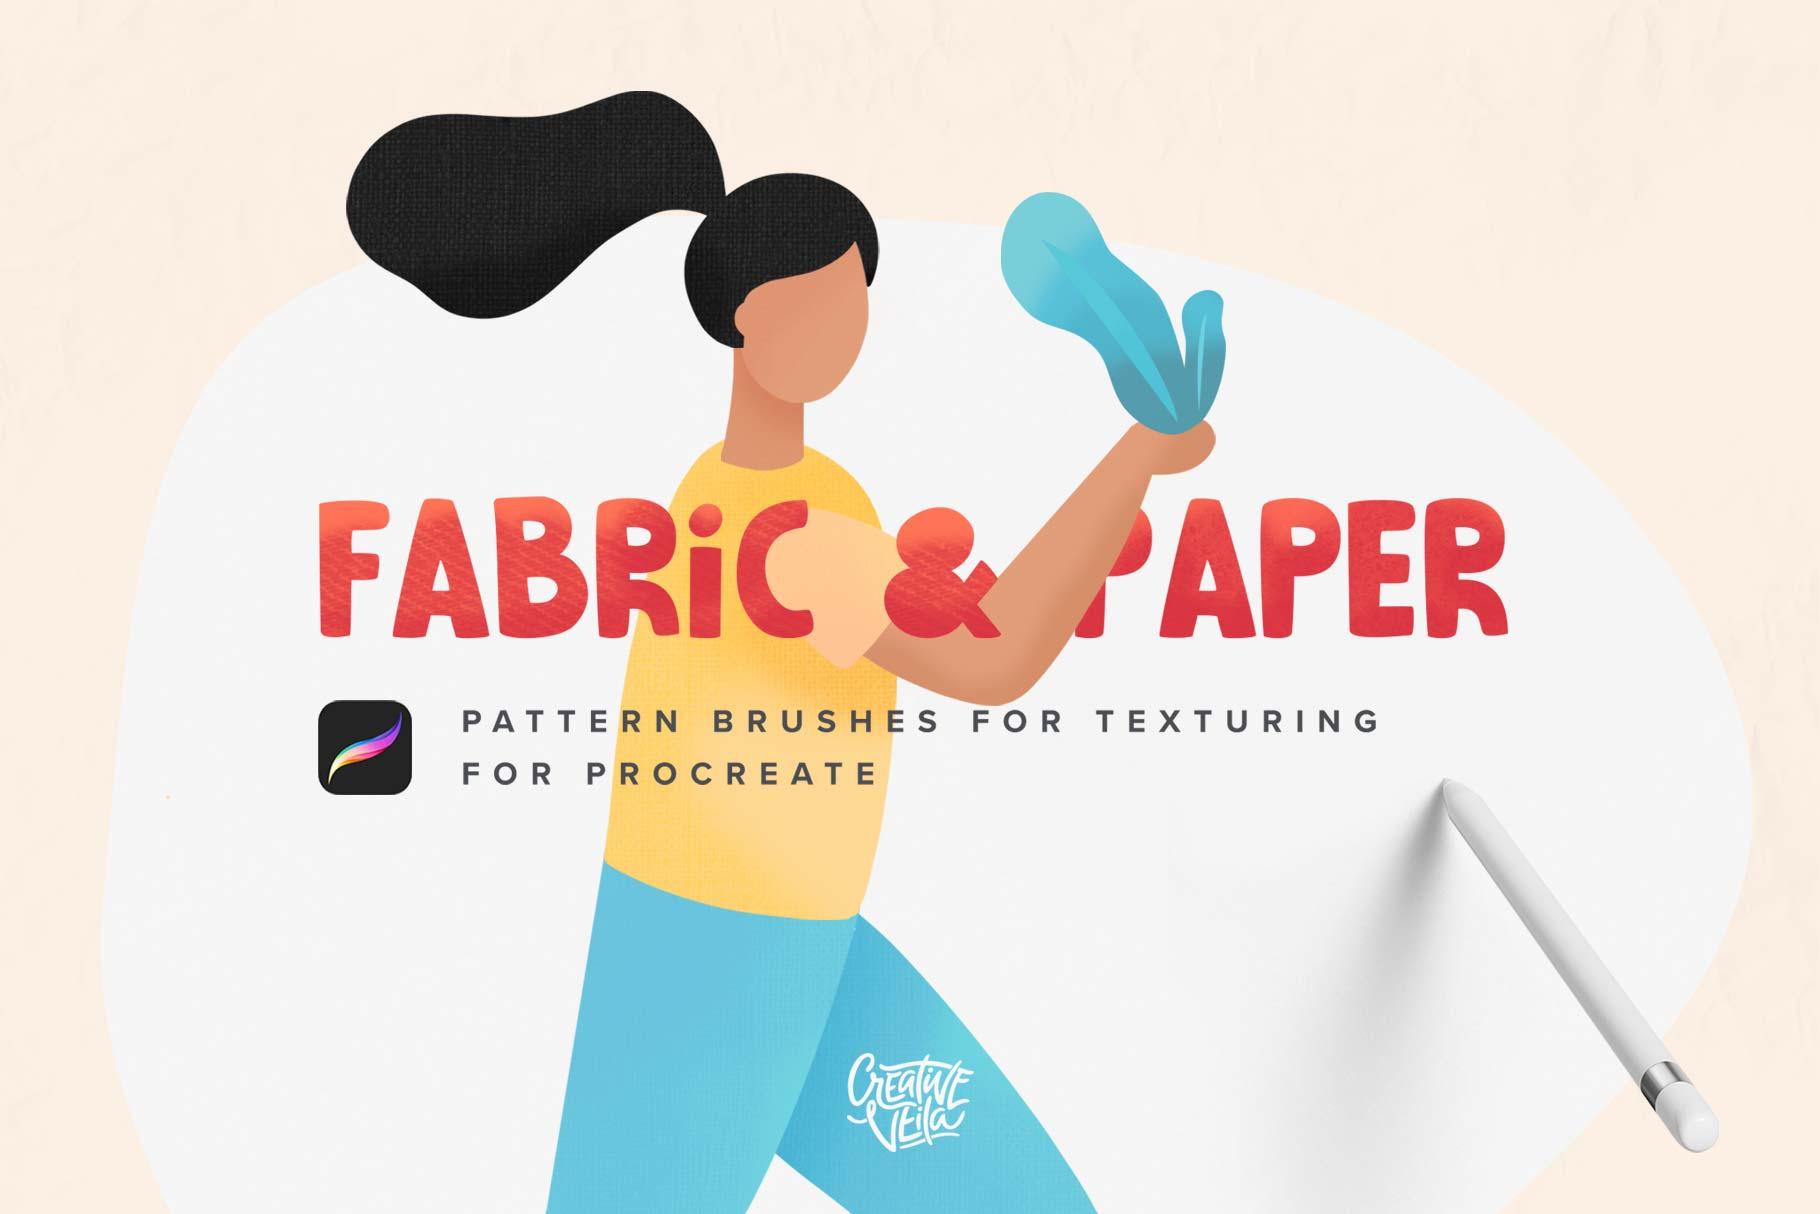 Creative Veila – Fabric & Paper Procreate Brushes